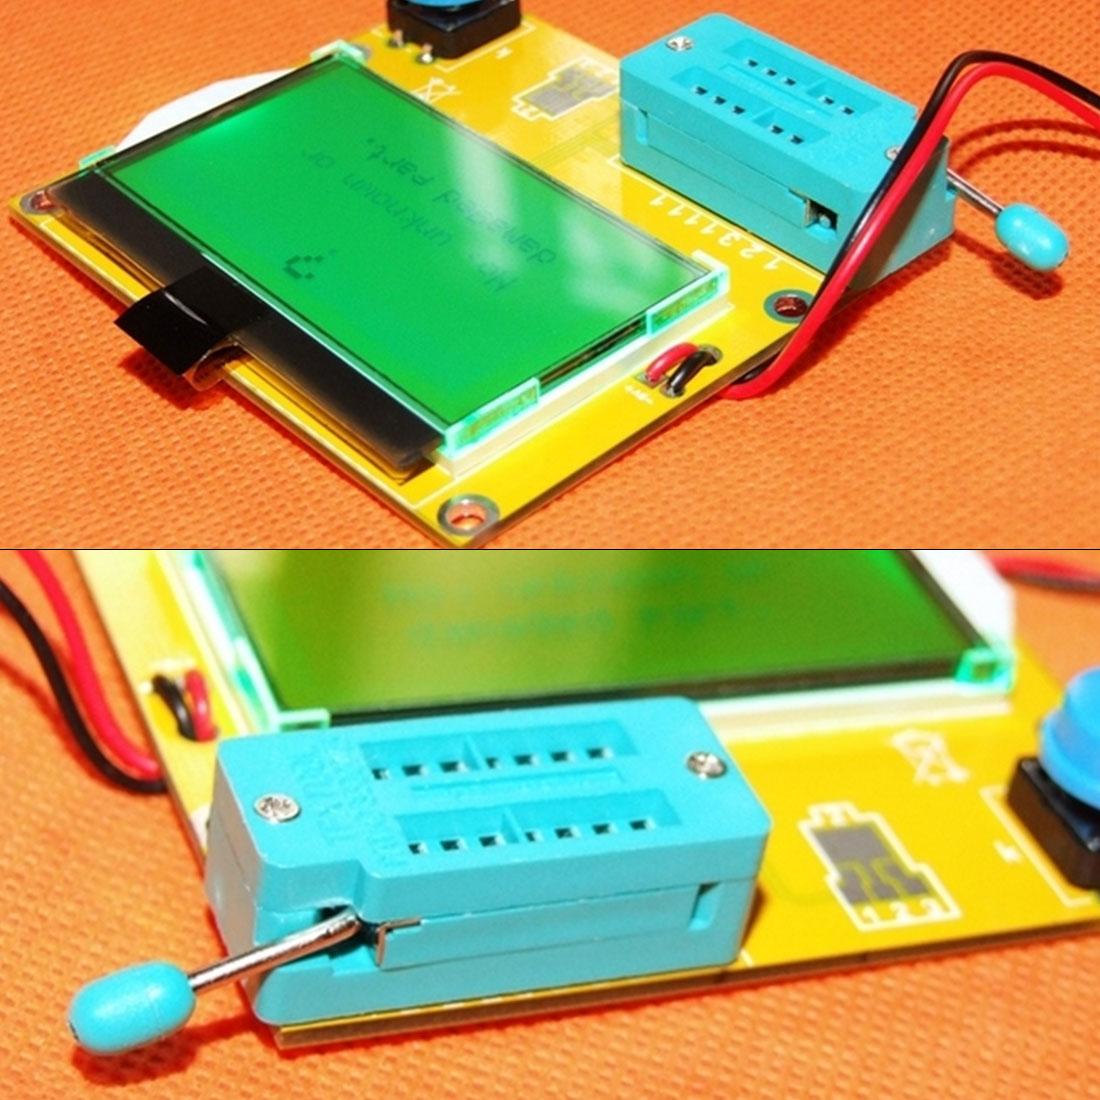 1 unid M328 LCR-T4 12846 LCD Digital Transistor Tester Meter diodo triodo capacitancia ESR Meter MOS/PNP/ NPN L/C/R